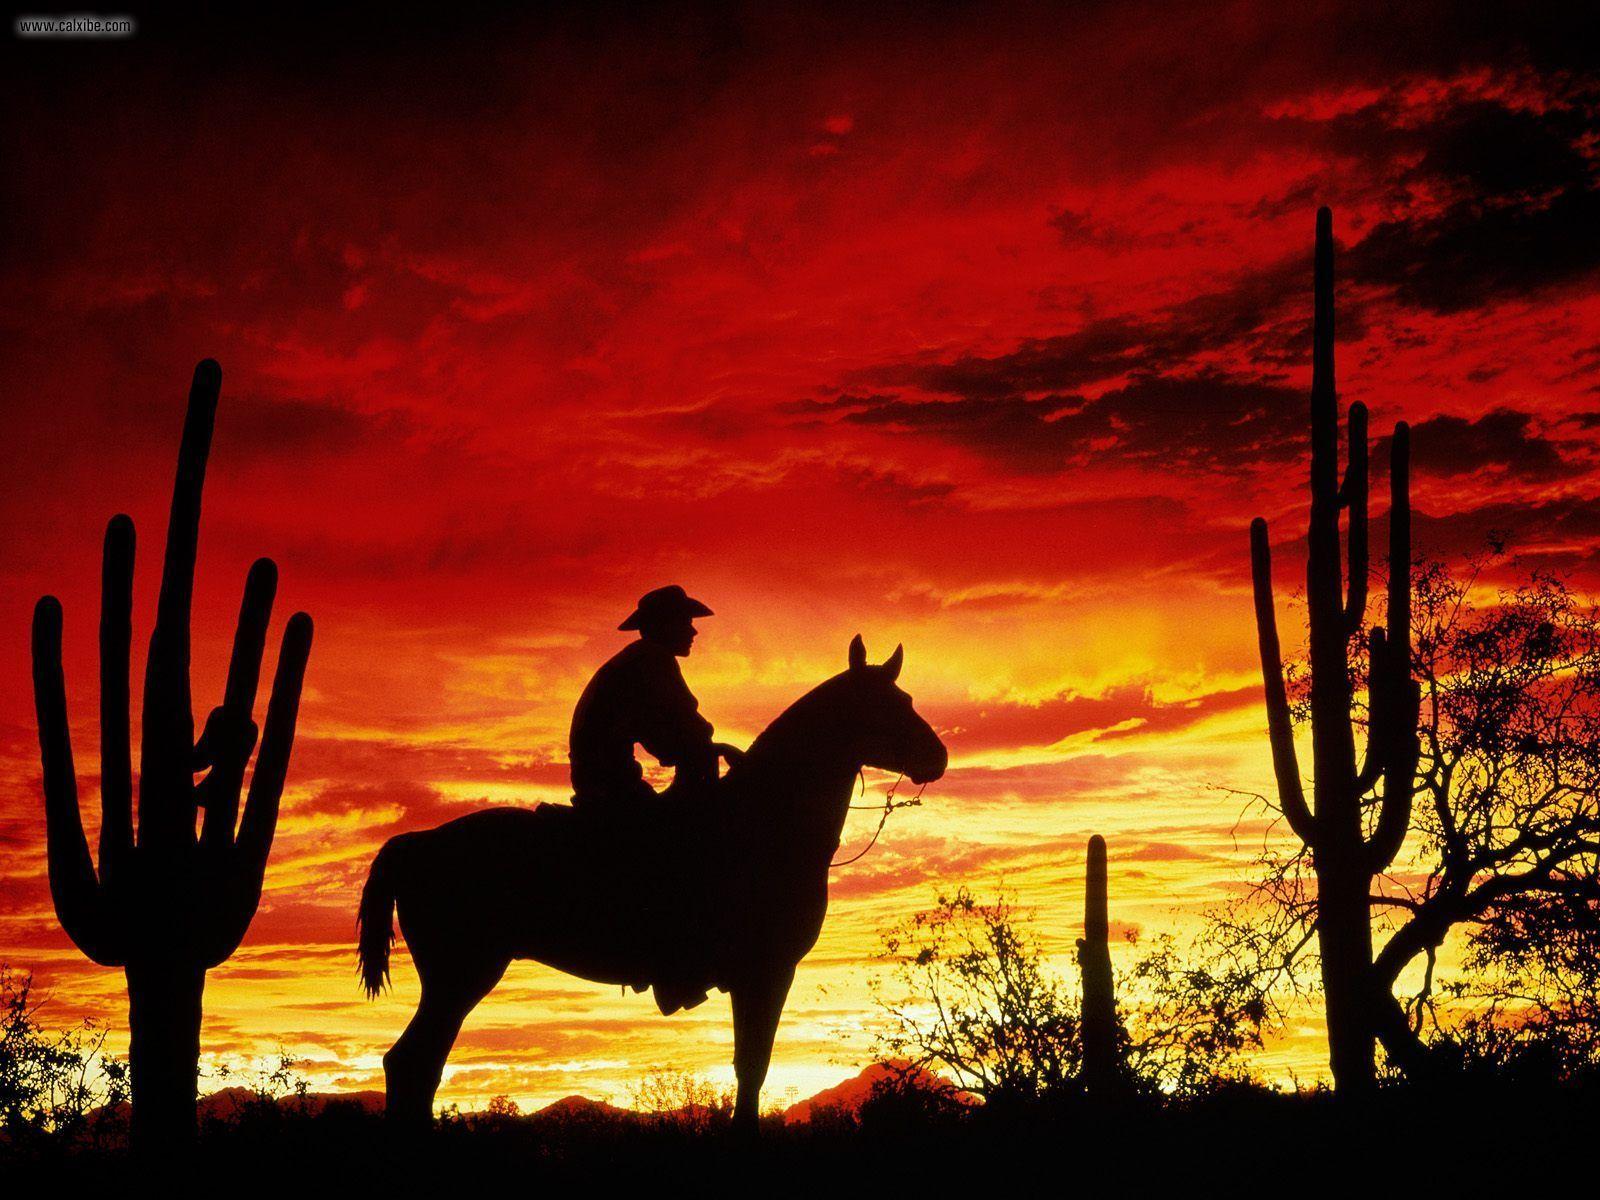 Hot Cowboy Backgrounds 1600x1200